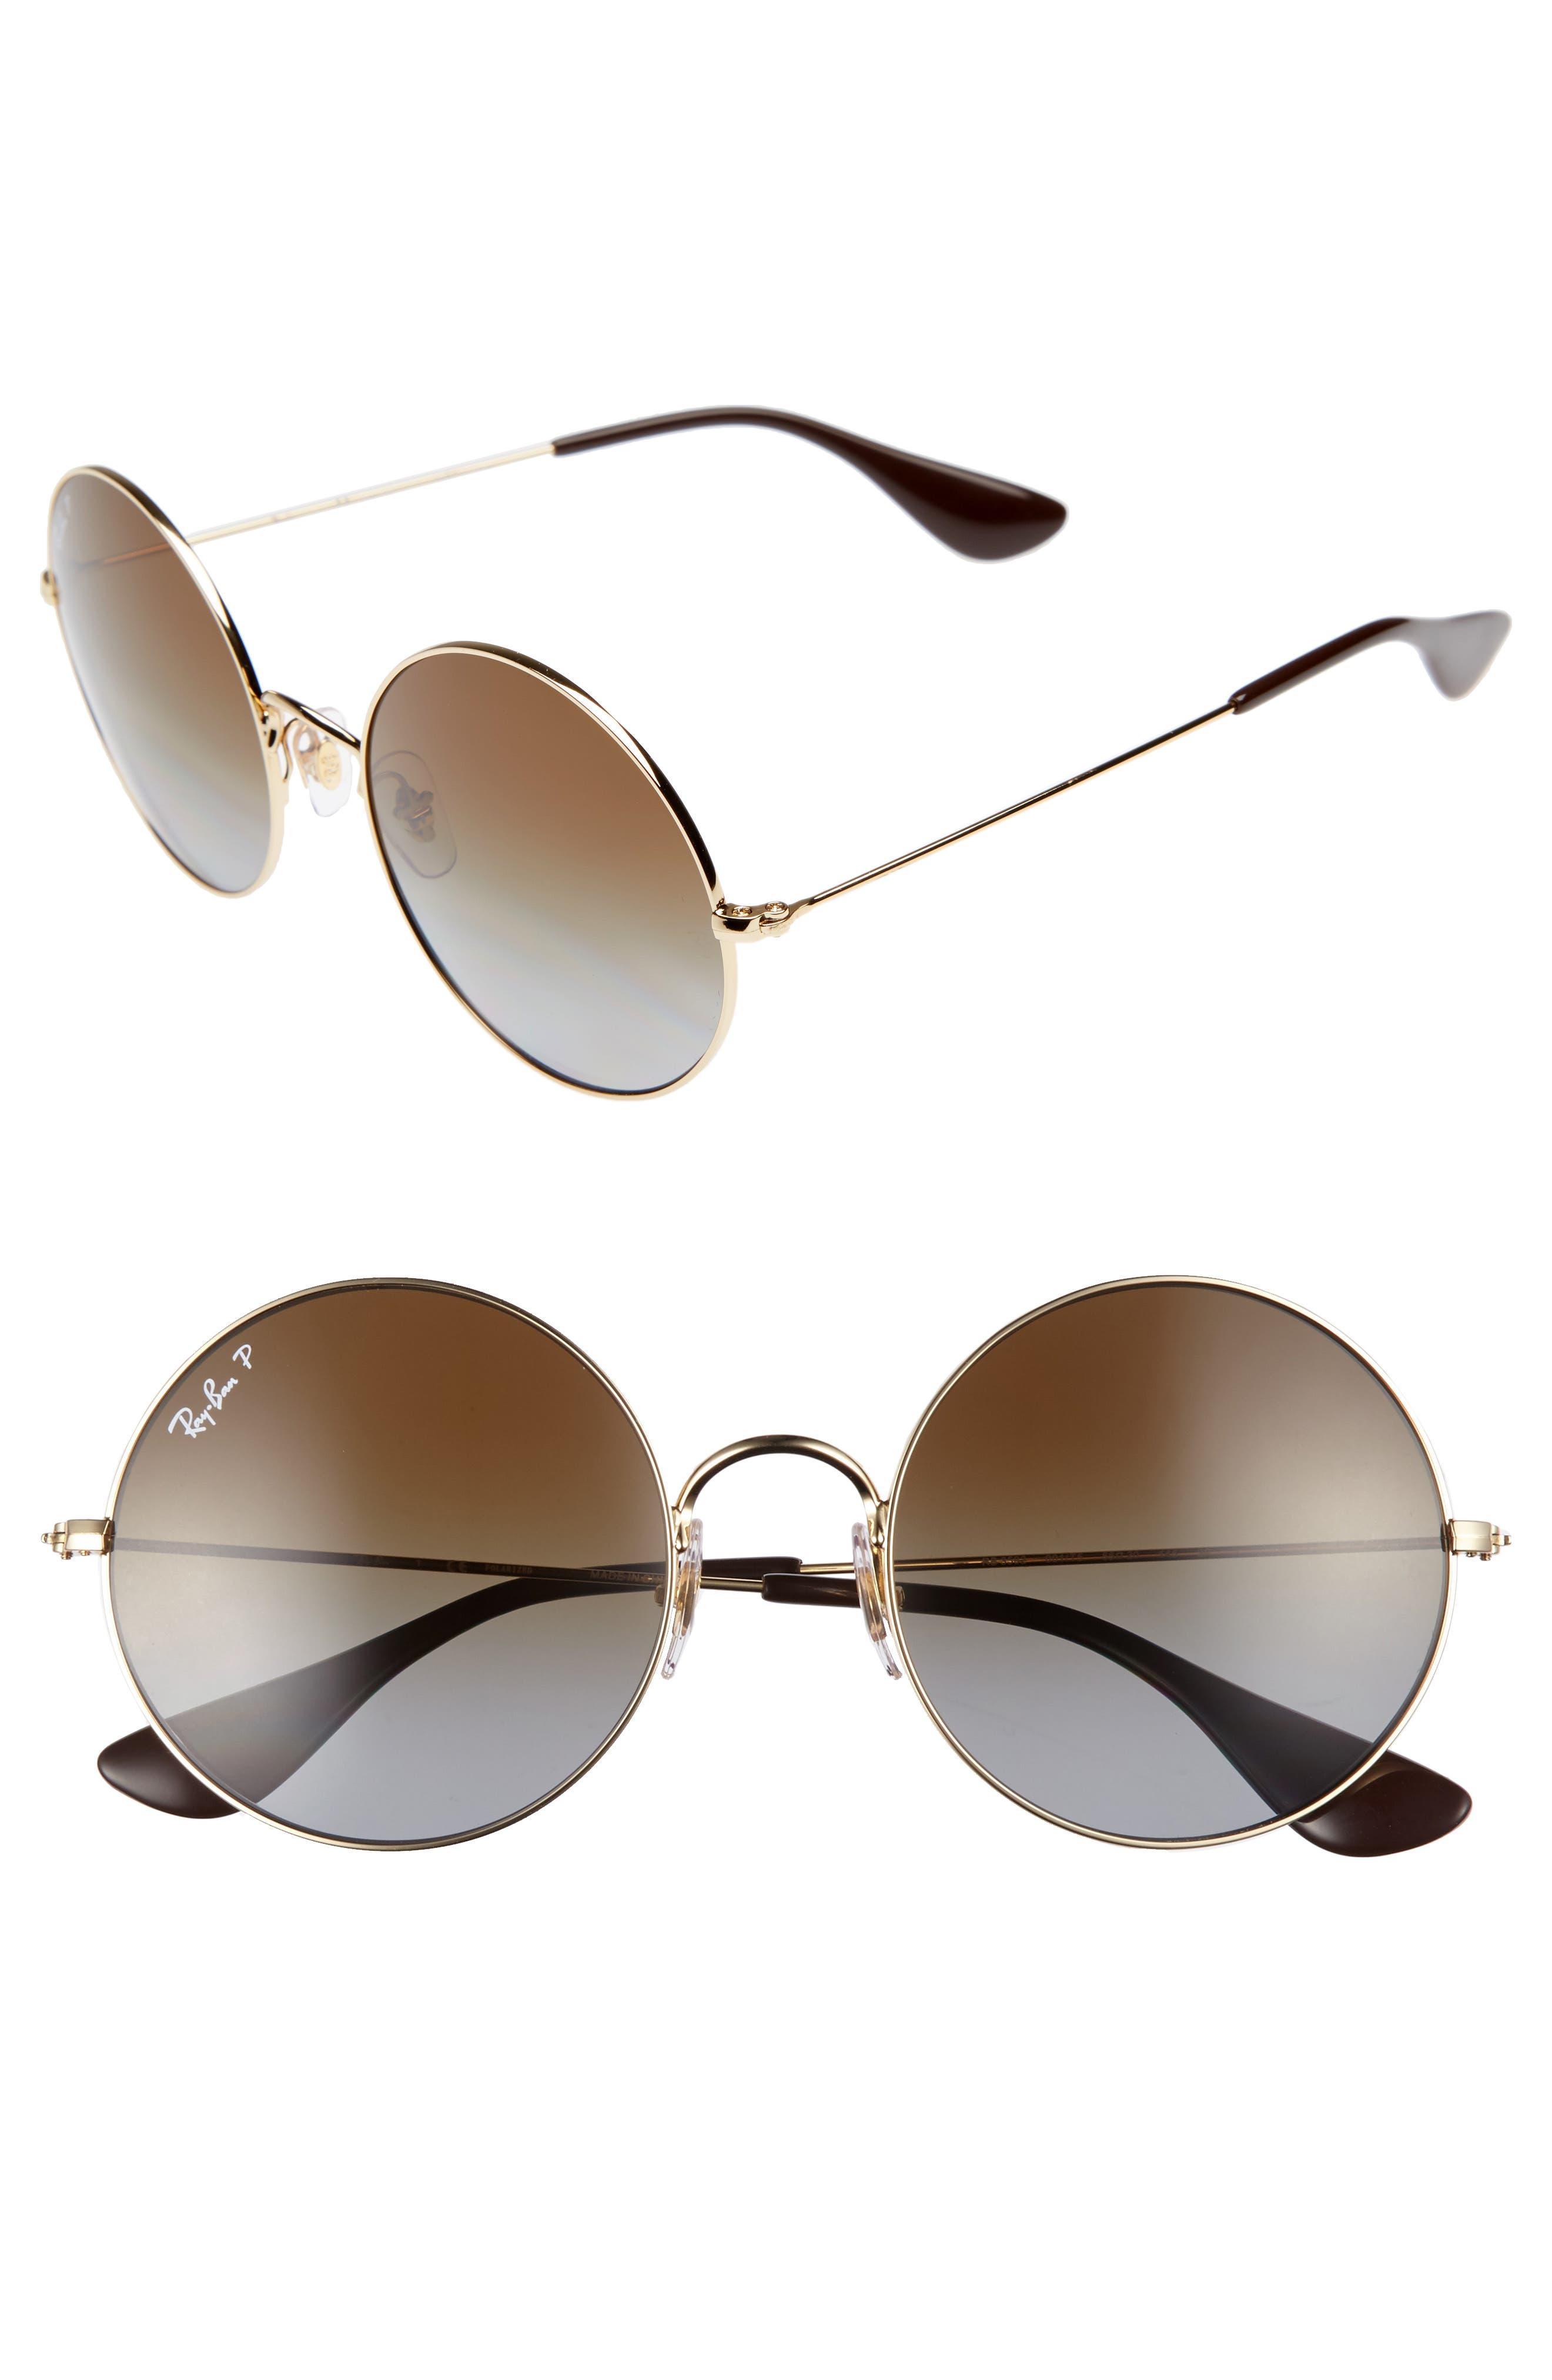 Main Image - Ray-Ban 55mm Polarized Round Sunglasses